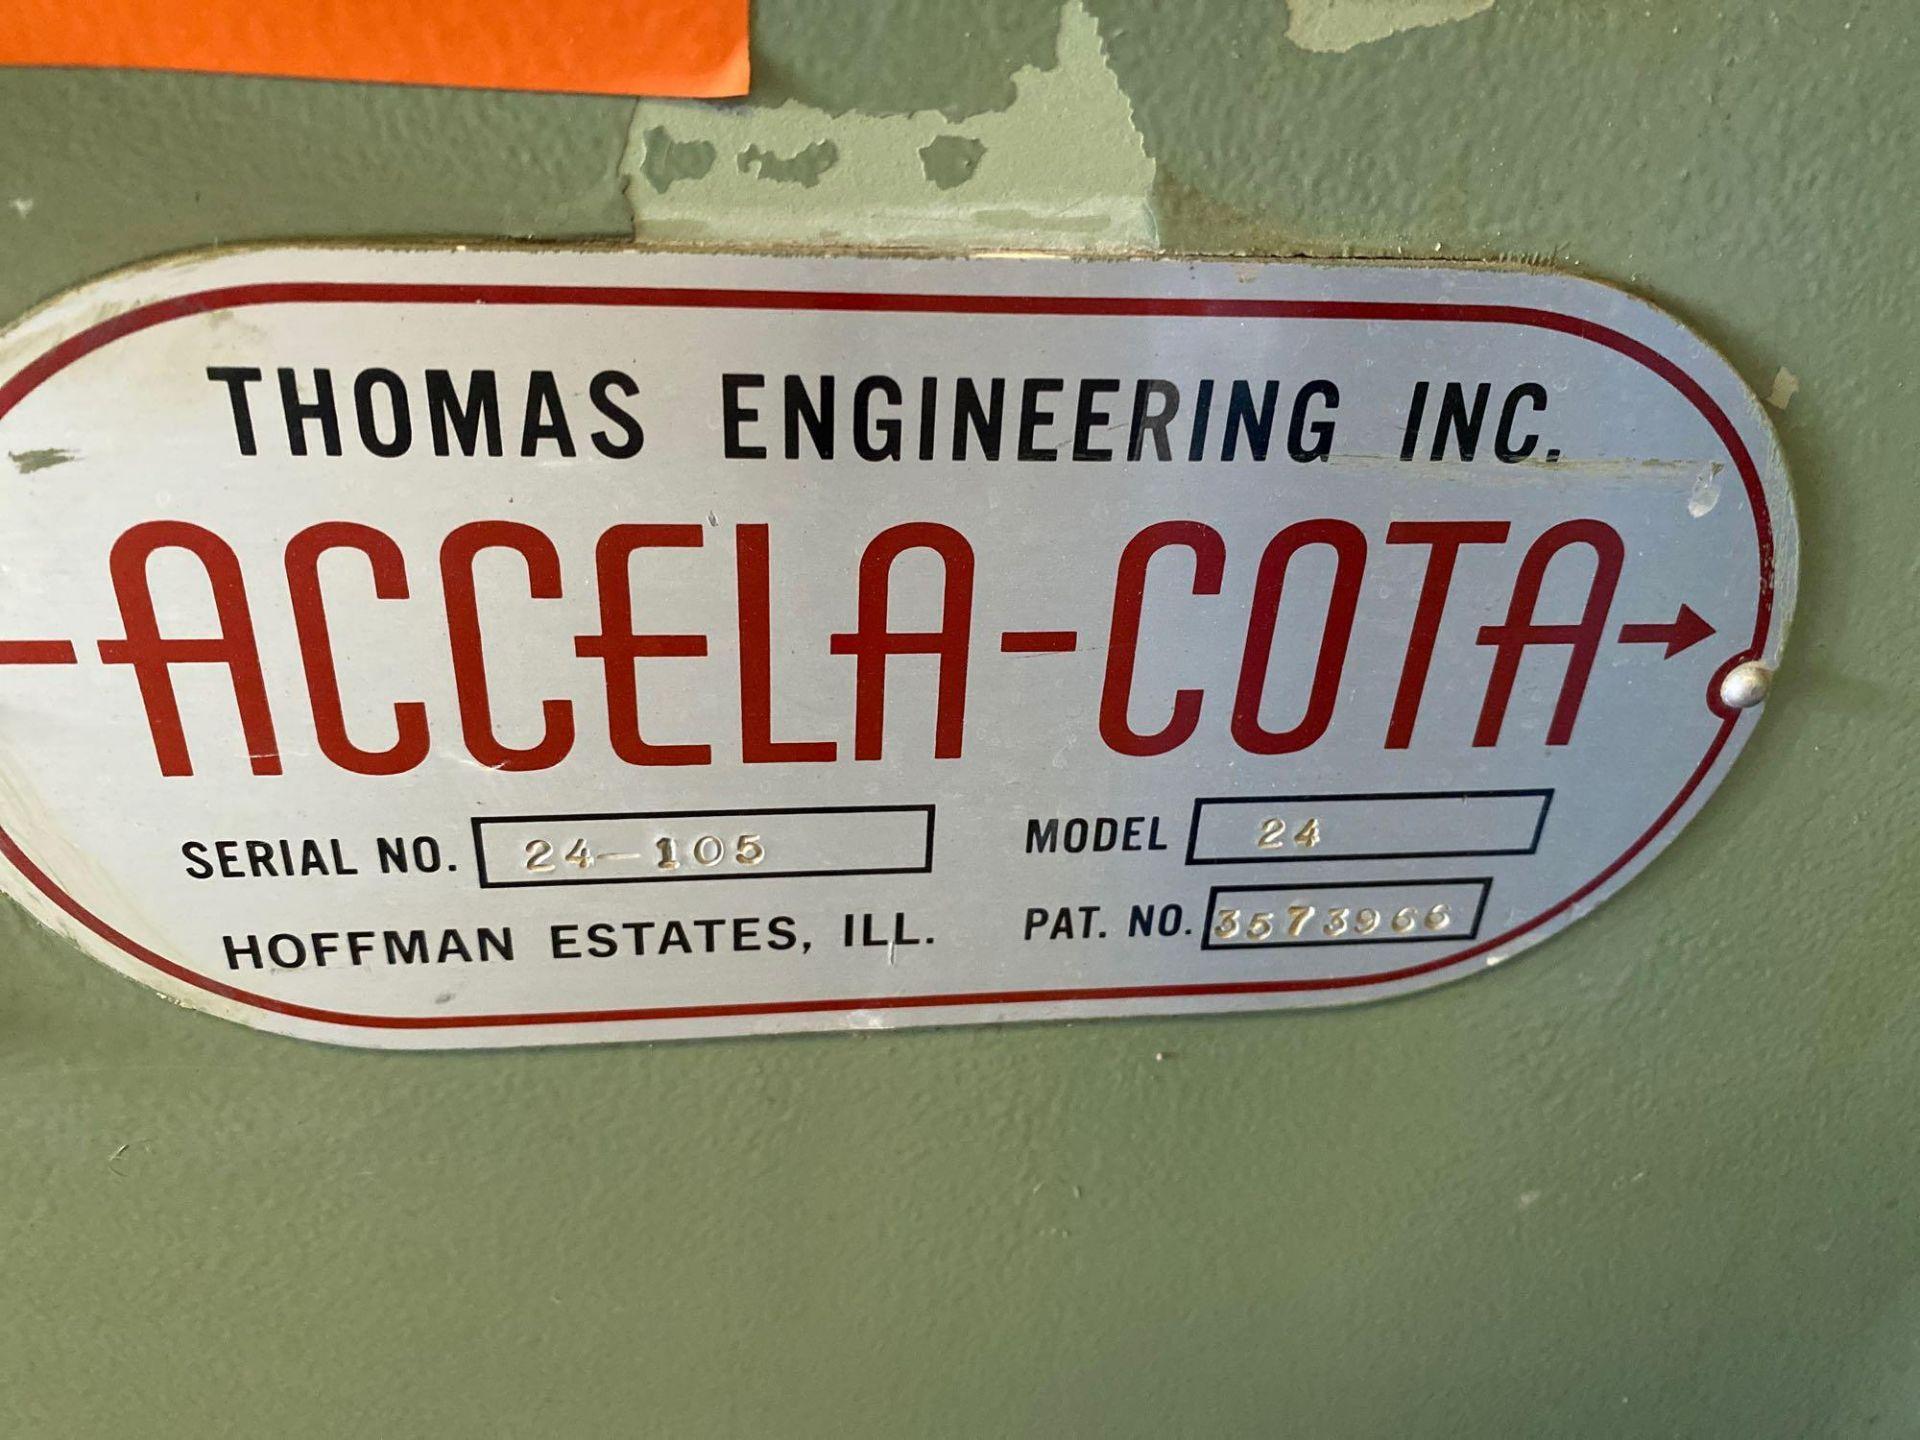 Accela-Cota Tablet Coater - Image 9 of 11